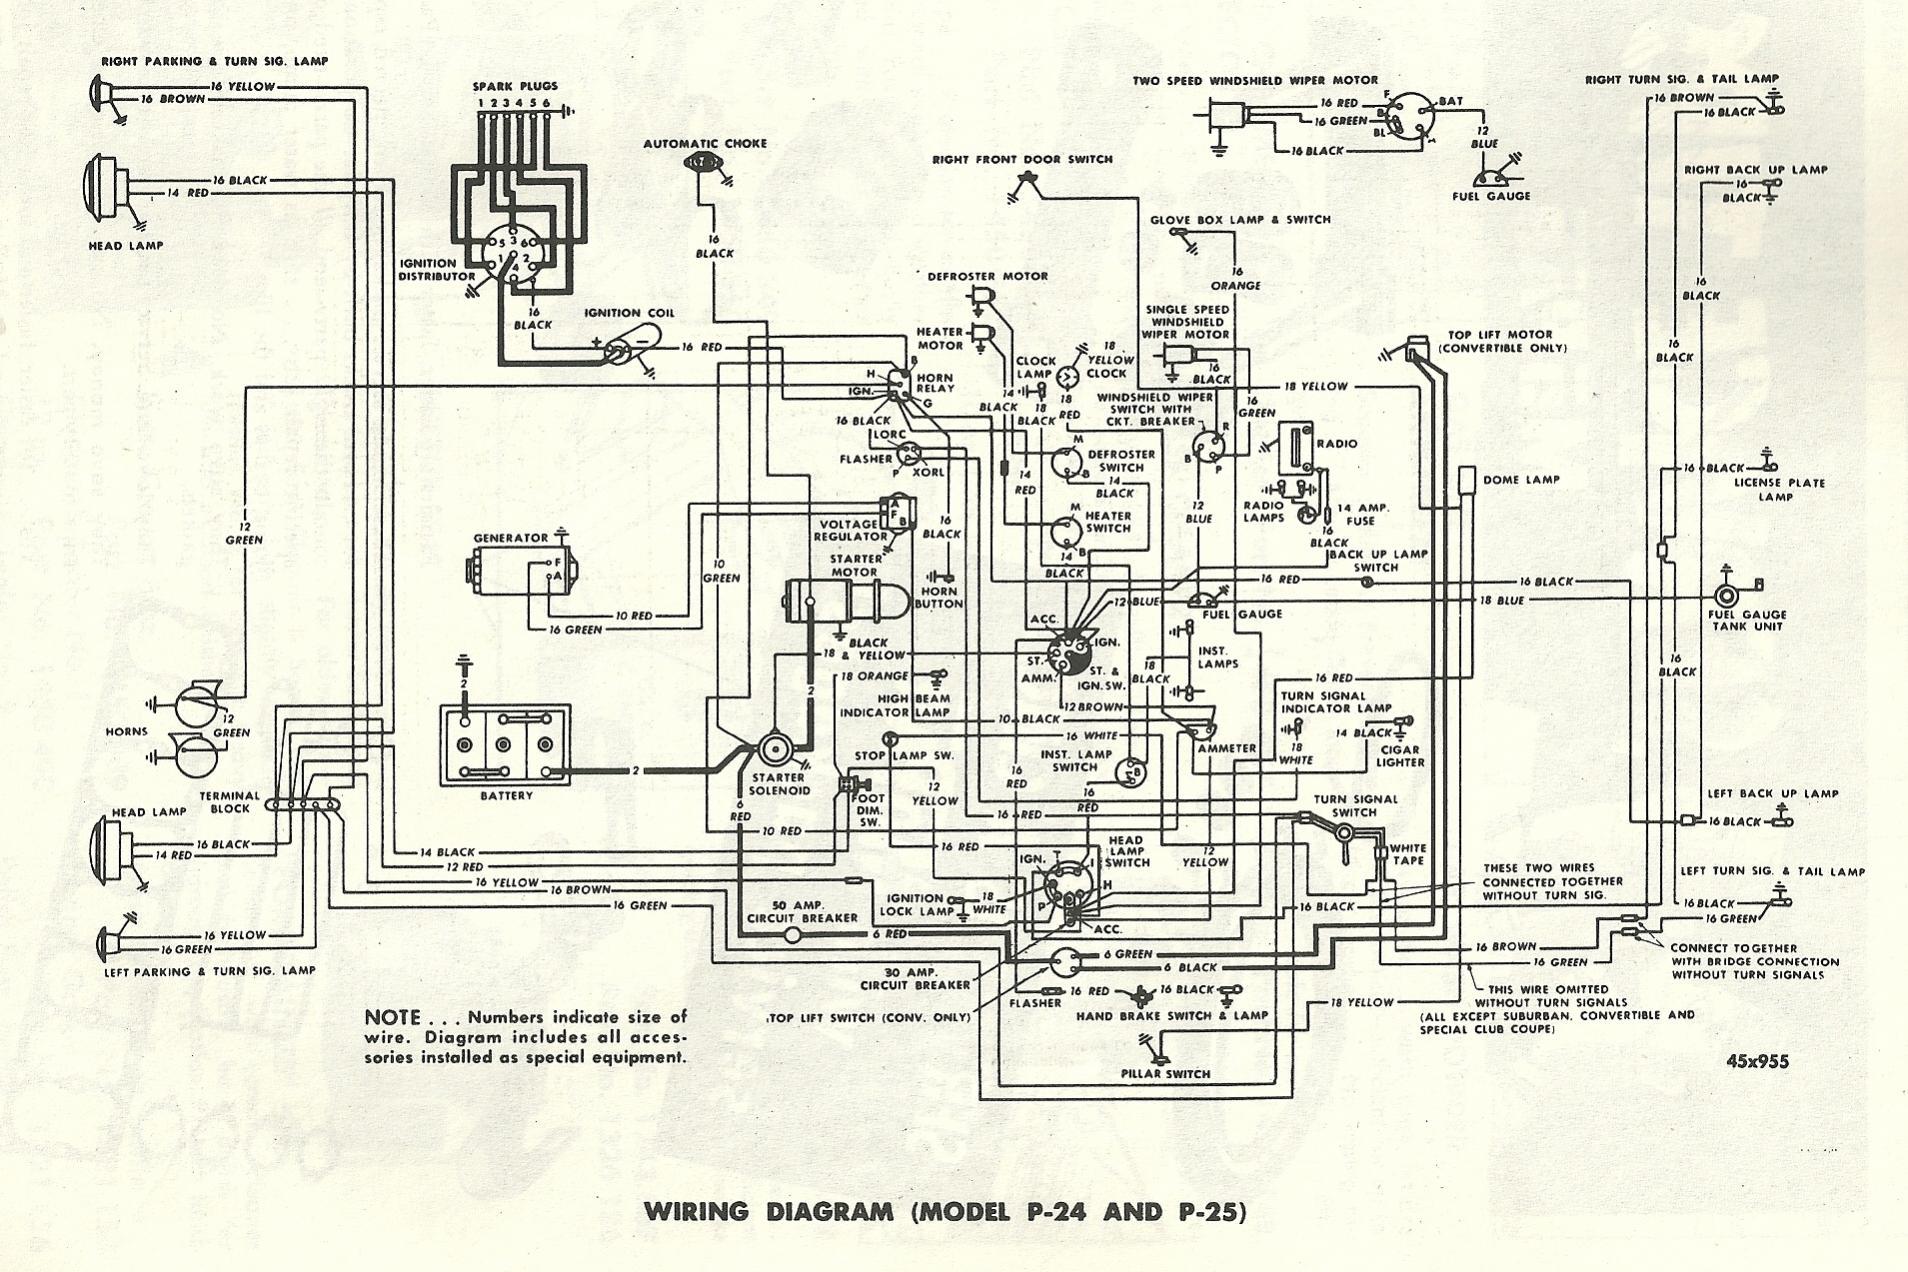 1951 Packard Wiring Diagram Get Free Image About Wiring Diagram